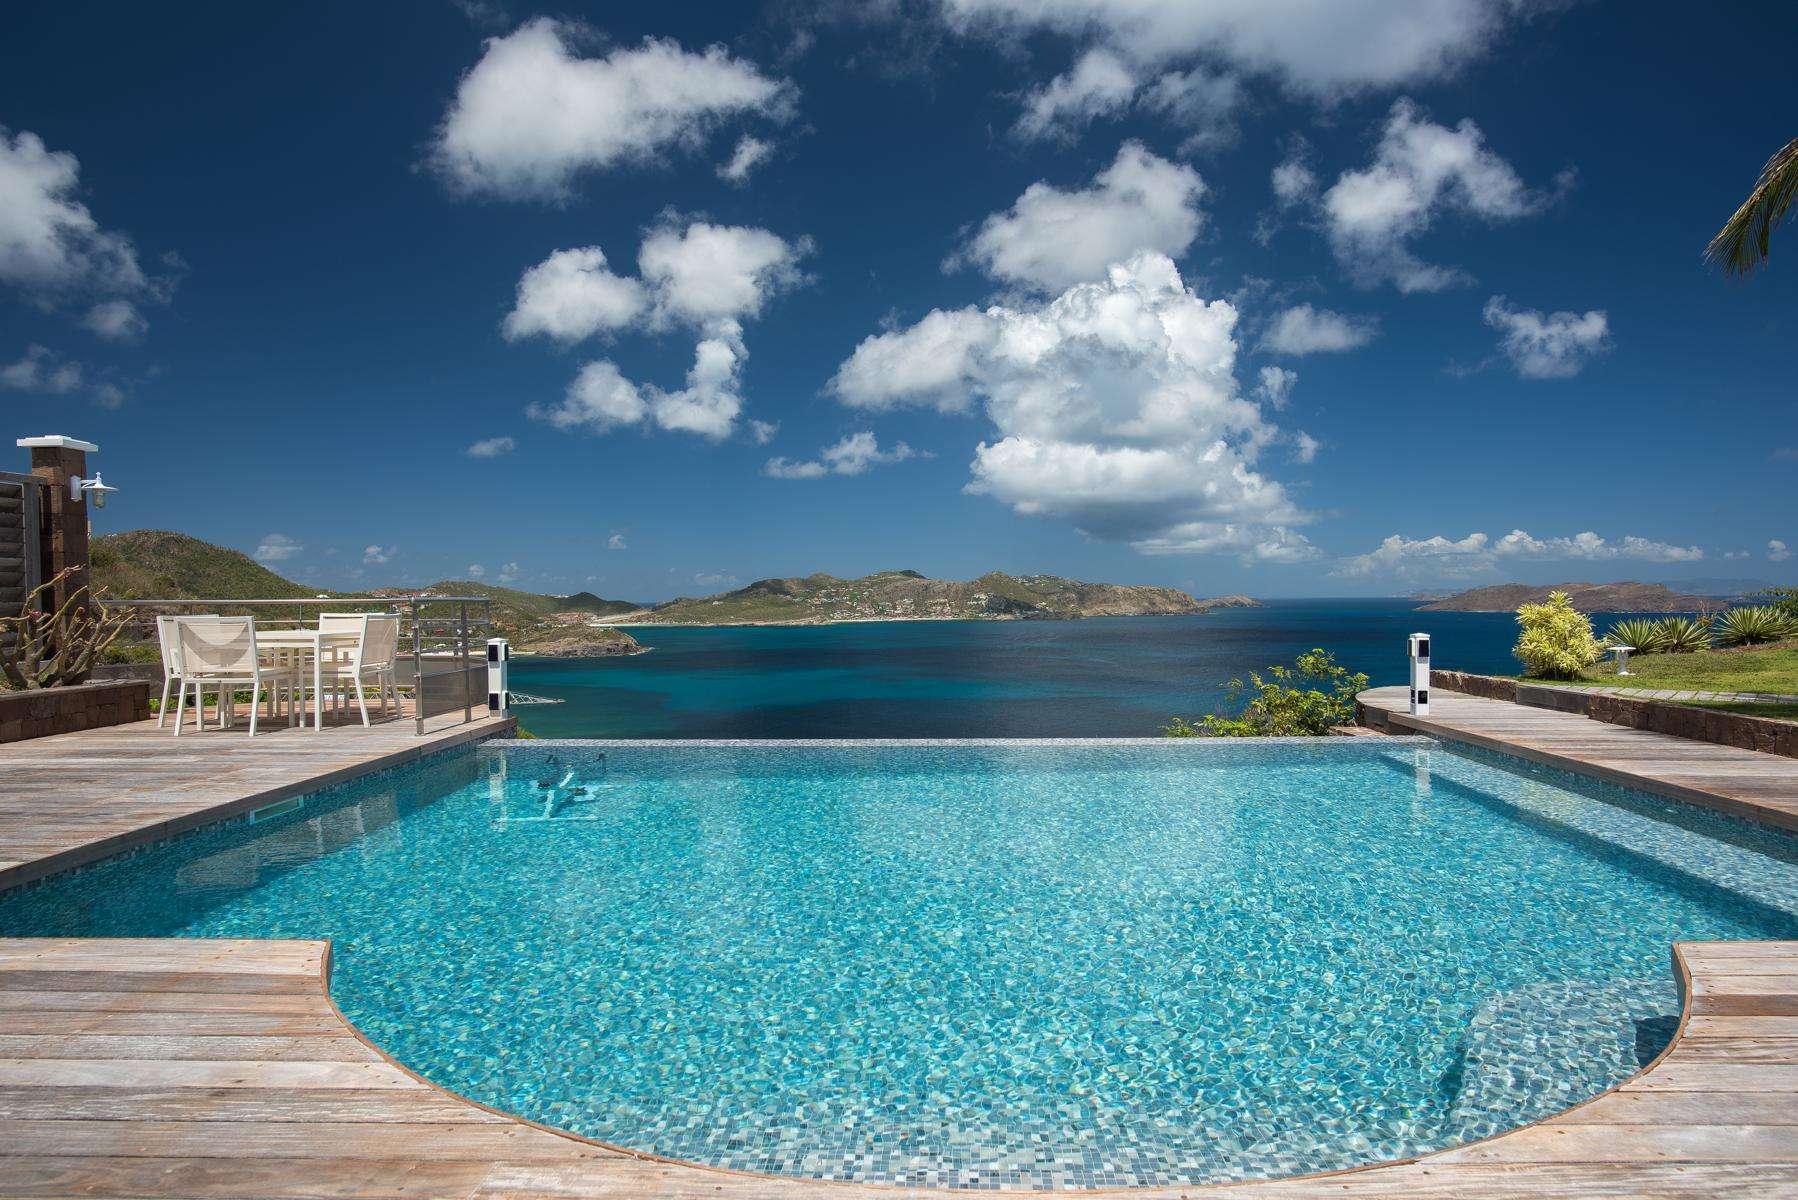 Luxury villa rentals caribbean - St barthelemy - Pointe milou - No location 4 - L'Abri Cotier - Image 1/22